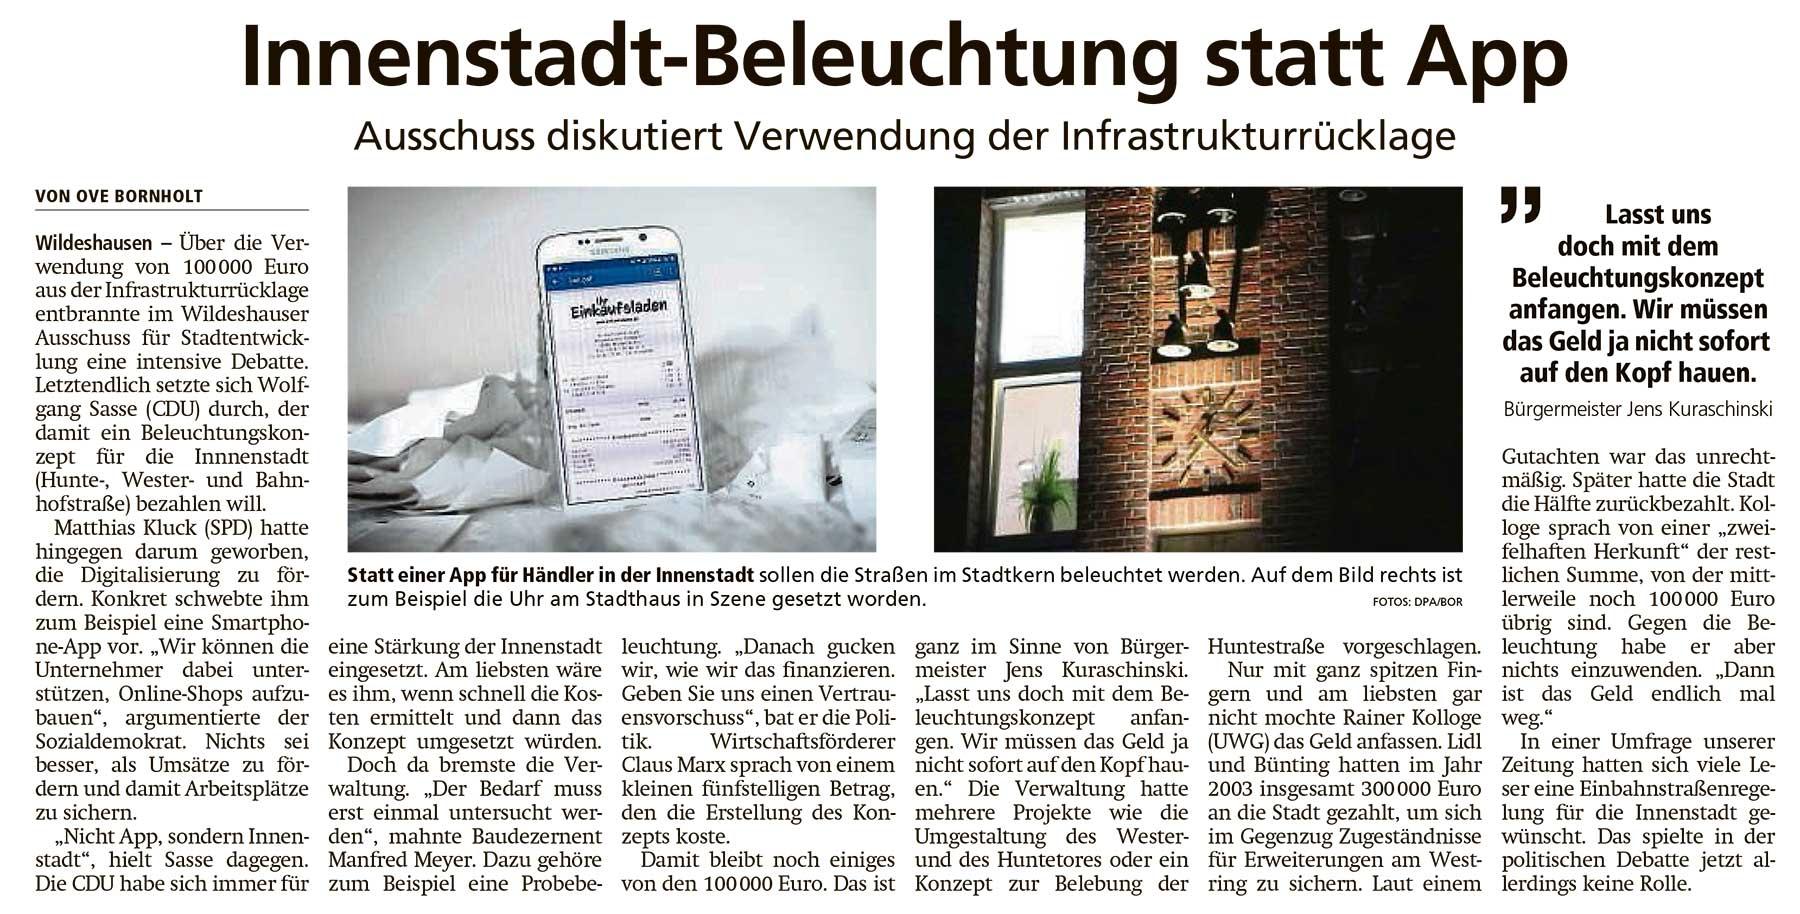 Innenstadt-Beleuchtung statt AppAusschuss diskutiert Verwendung der InfrastrukturrücklageArtikel vom 23.11.2020 (WZ)